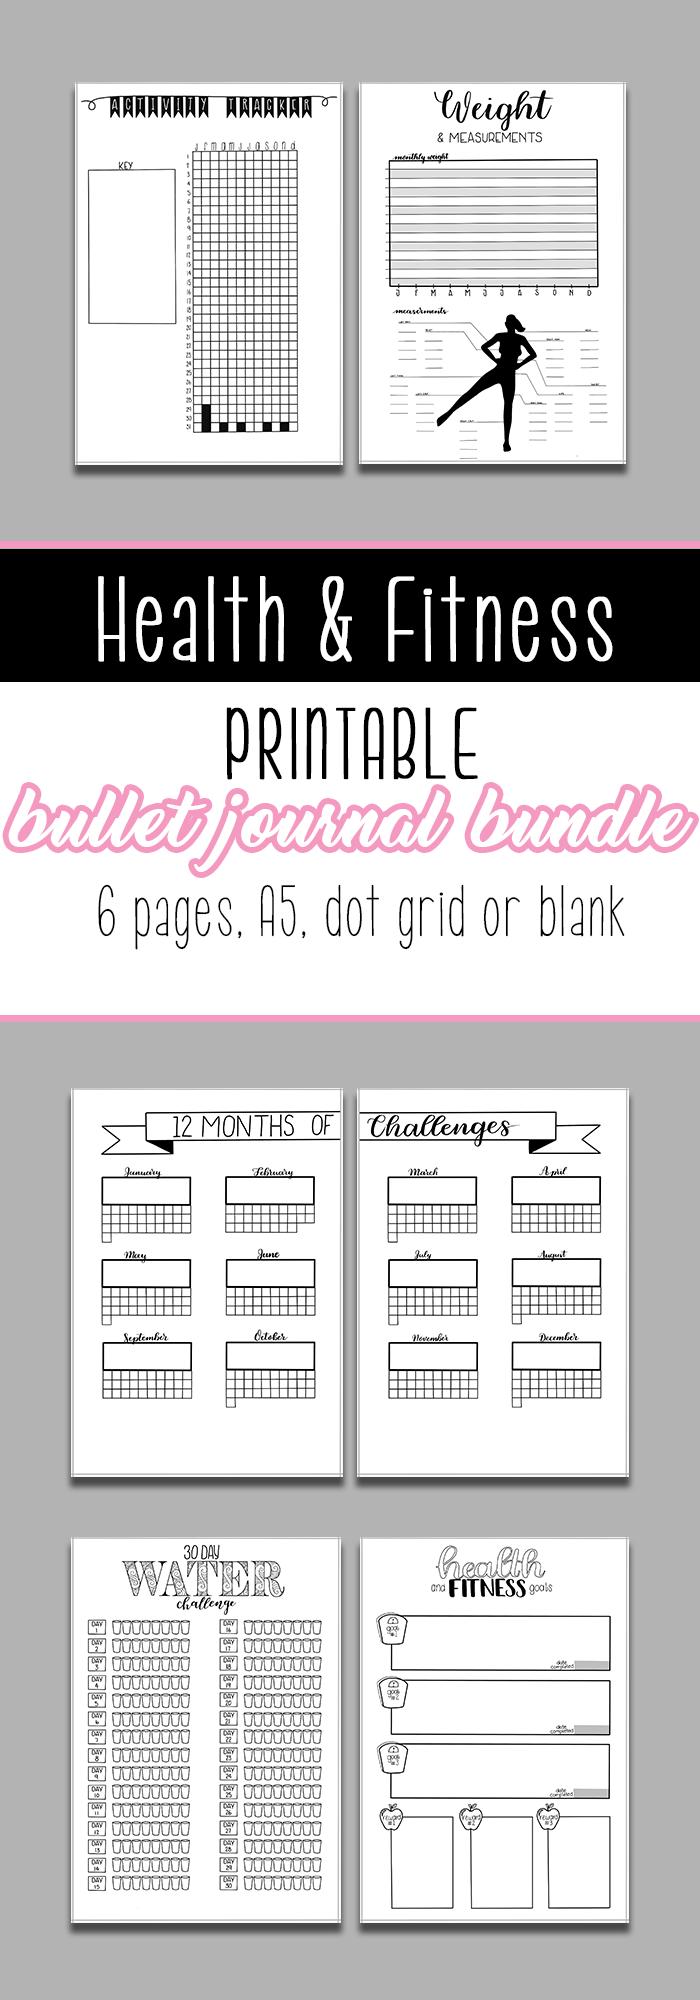 #printables #printable #journals #fitness #journal #health #bullet #bundle #pages #track #goals #kee...